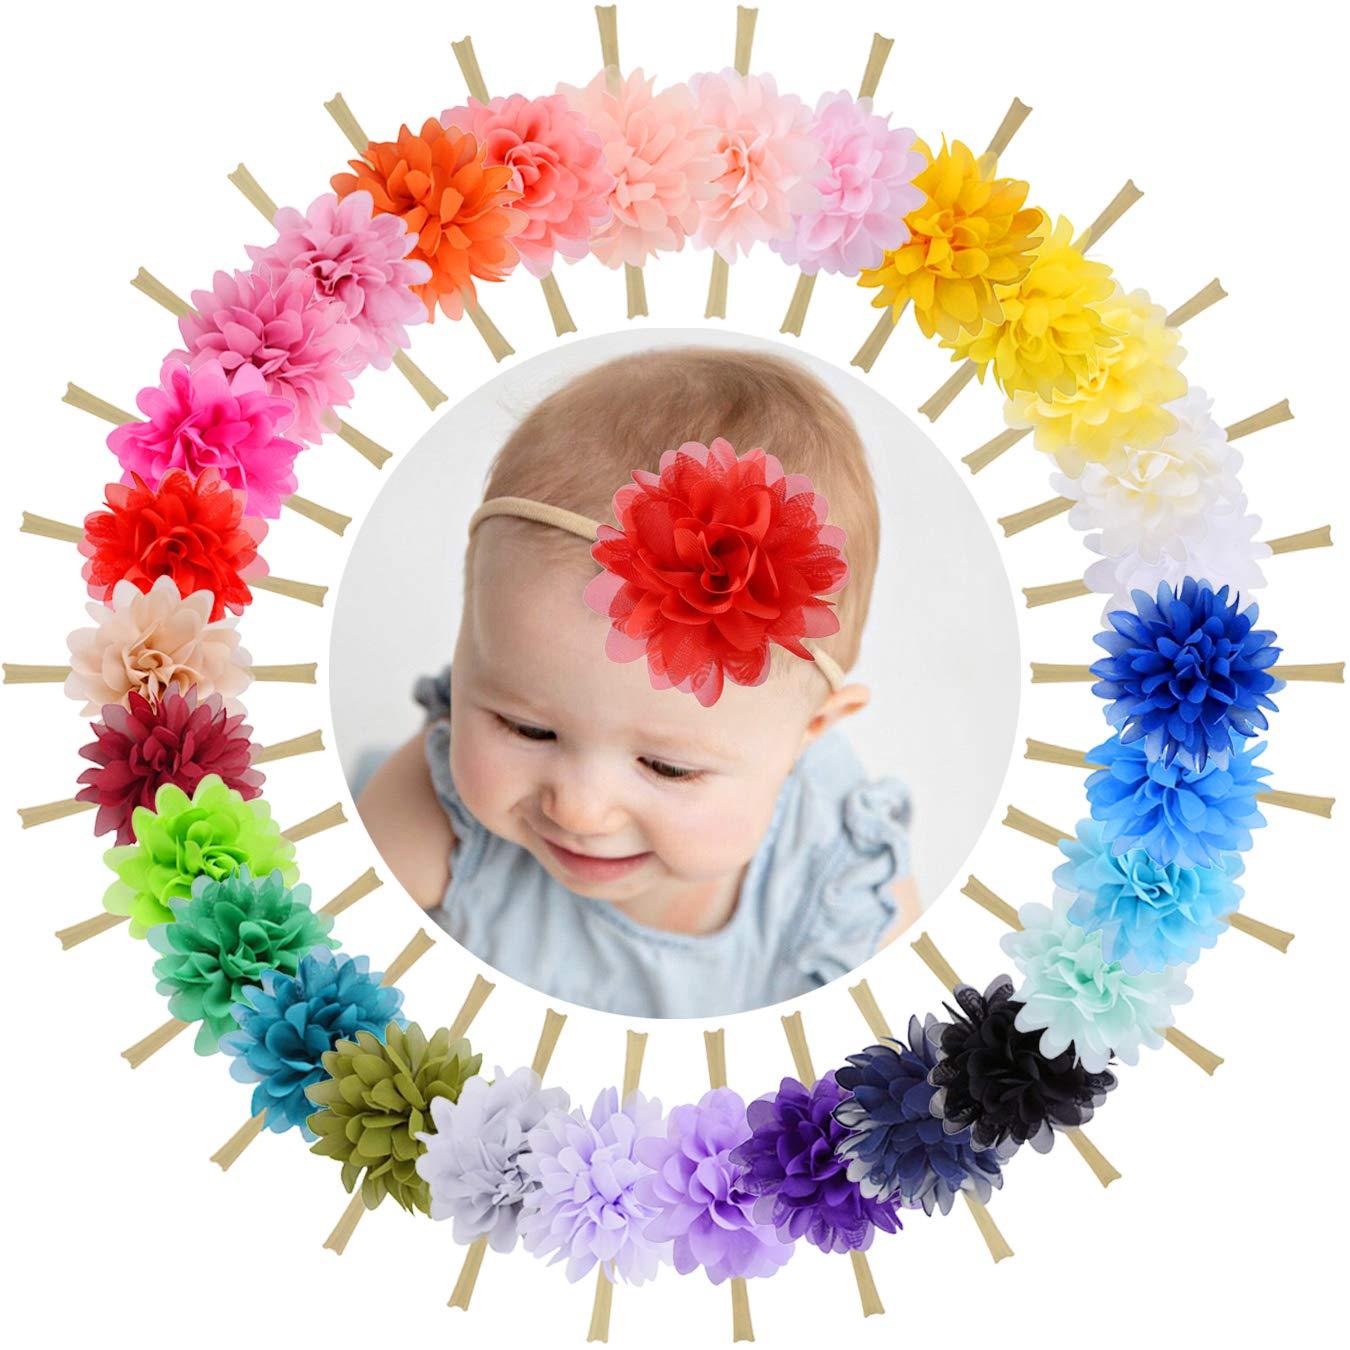 WillingTee 30 Colors 4 Inch Chiffon Flower Nylon Hairbands Soft Headbands Hair Accessories for Baby Girls Infants Toddlers Newborns